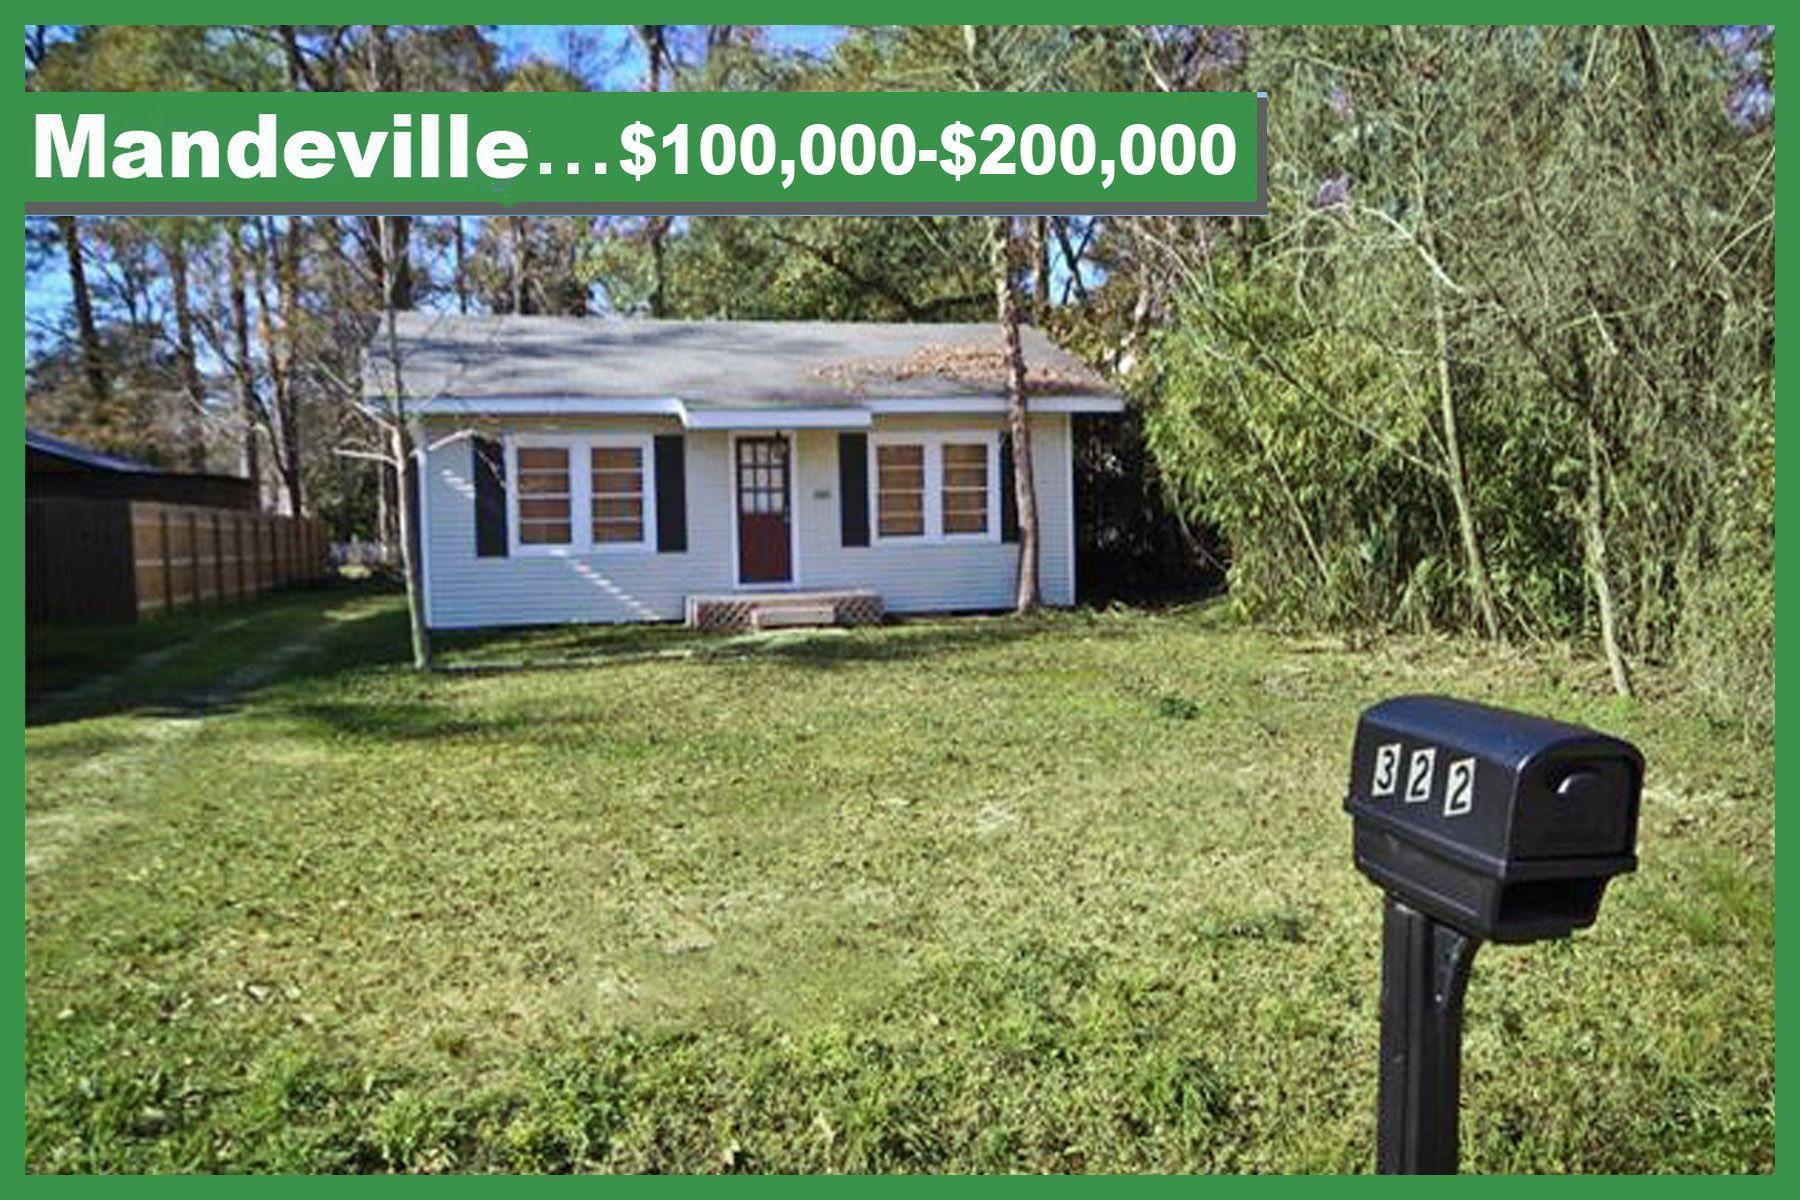 Mandeville Louisiana Real Estate 100 000 200 000 St Tammany Homes Patio Homes Condos Townhouses And Mo La Real Estate Real Estate Real Estate Listings